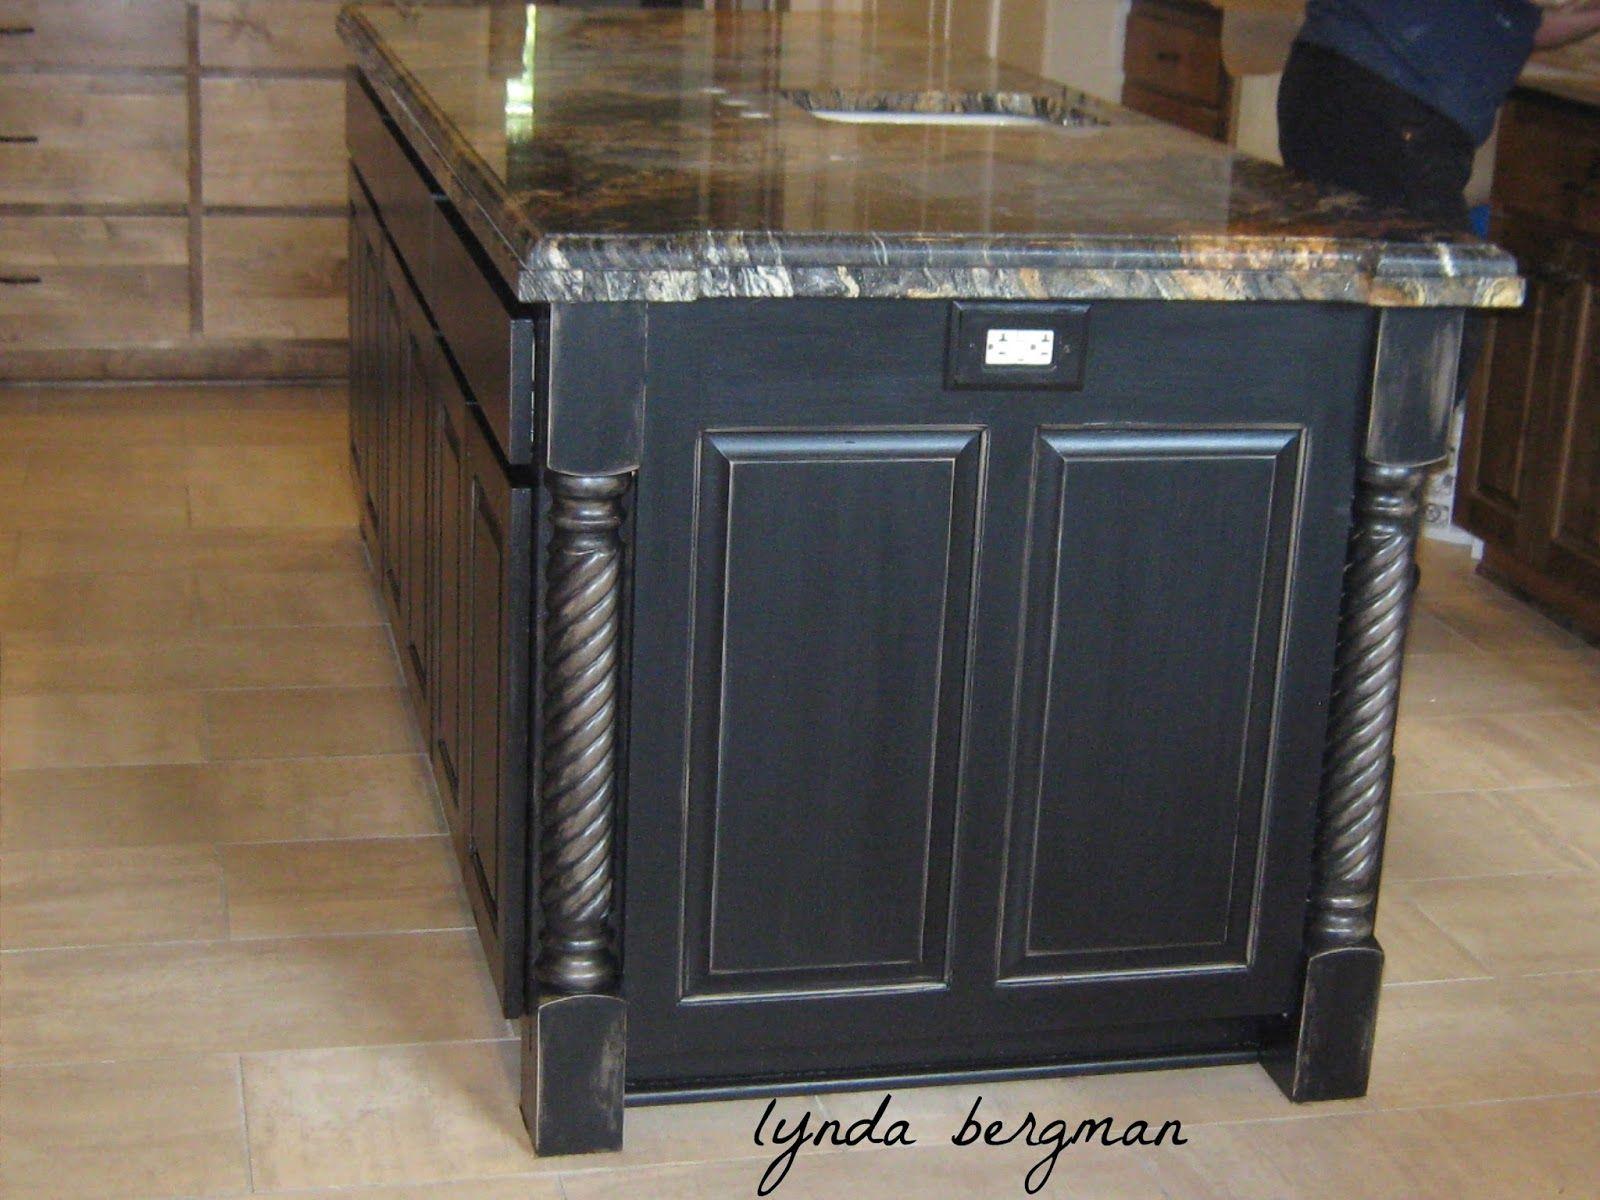 Lynda Bergman Decorative Artisan Painting Veronica S Kitchen Island Wine Cabinet A B Antique Kitchen Cabinets Distressed Kitchen Distressed Kitchen Cabinets